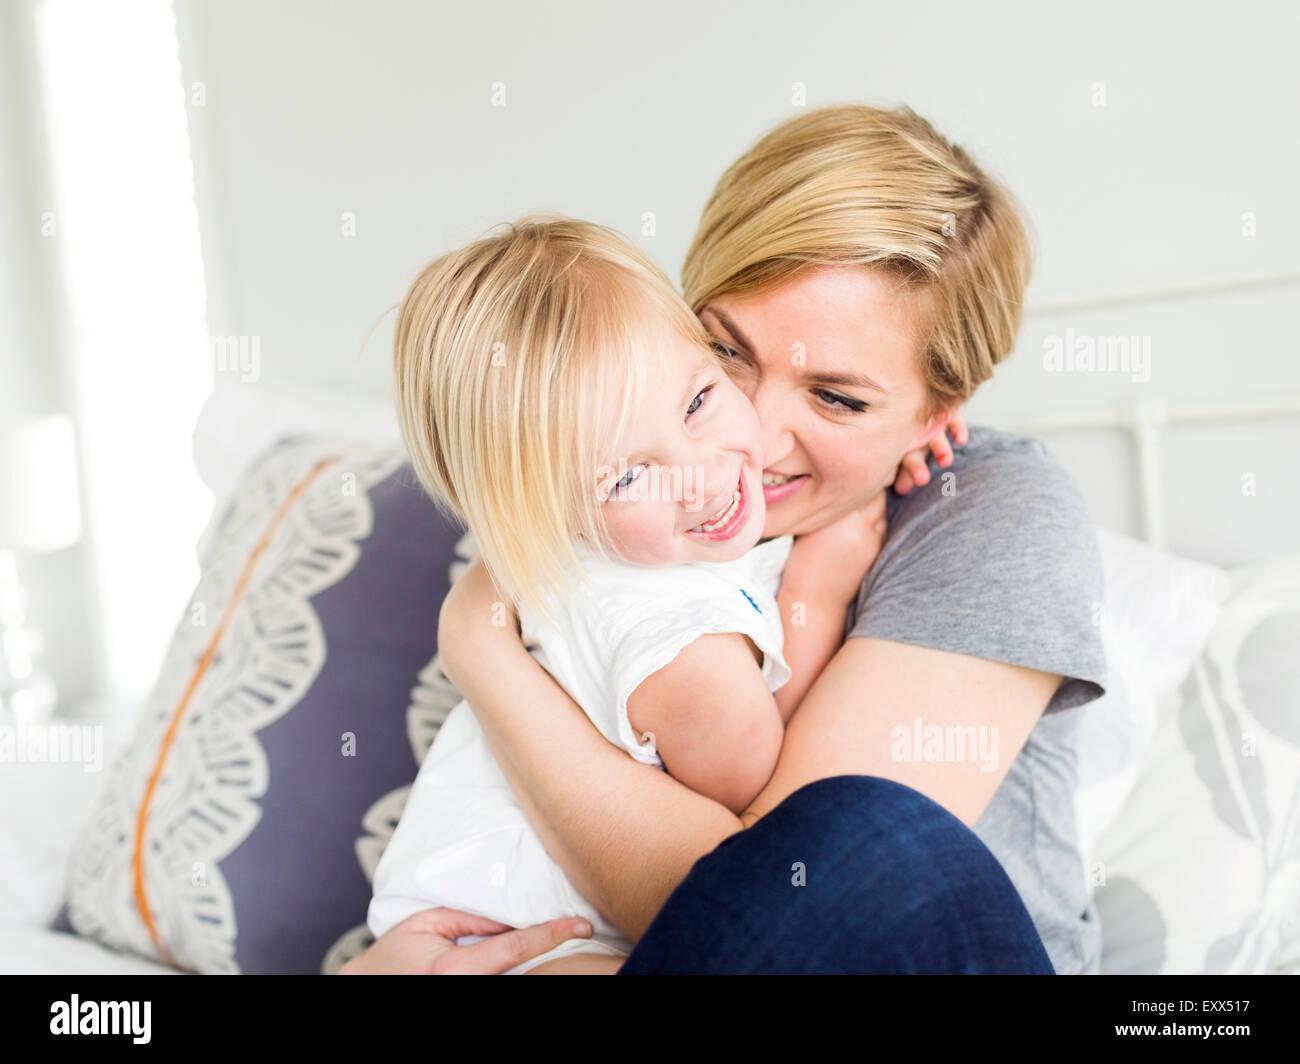 Woman hugging daughter (2-3) in bedroom - Stock Image